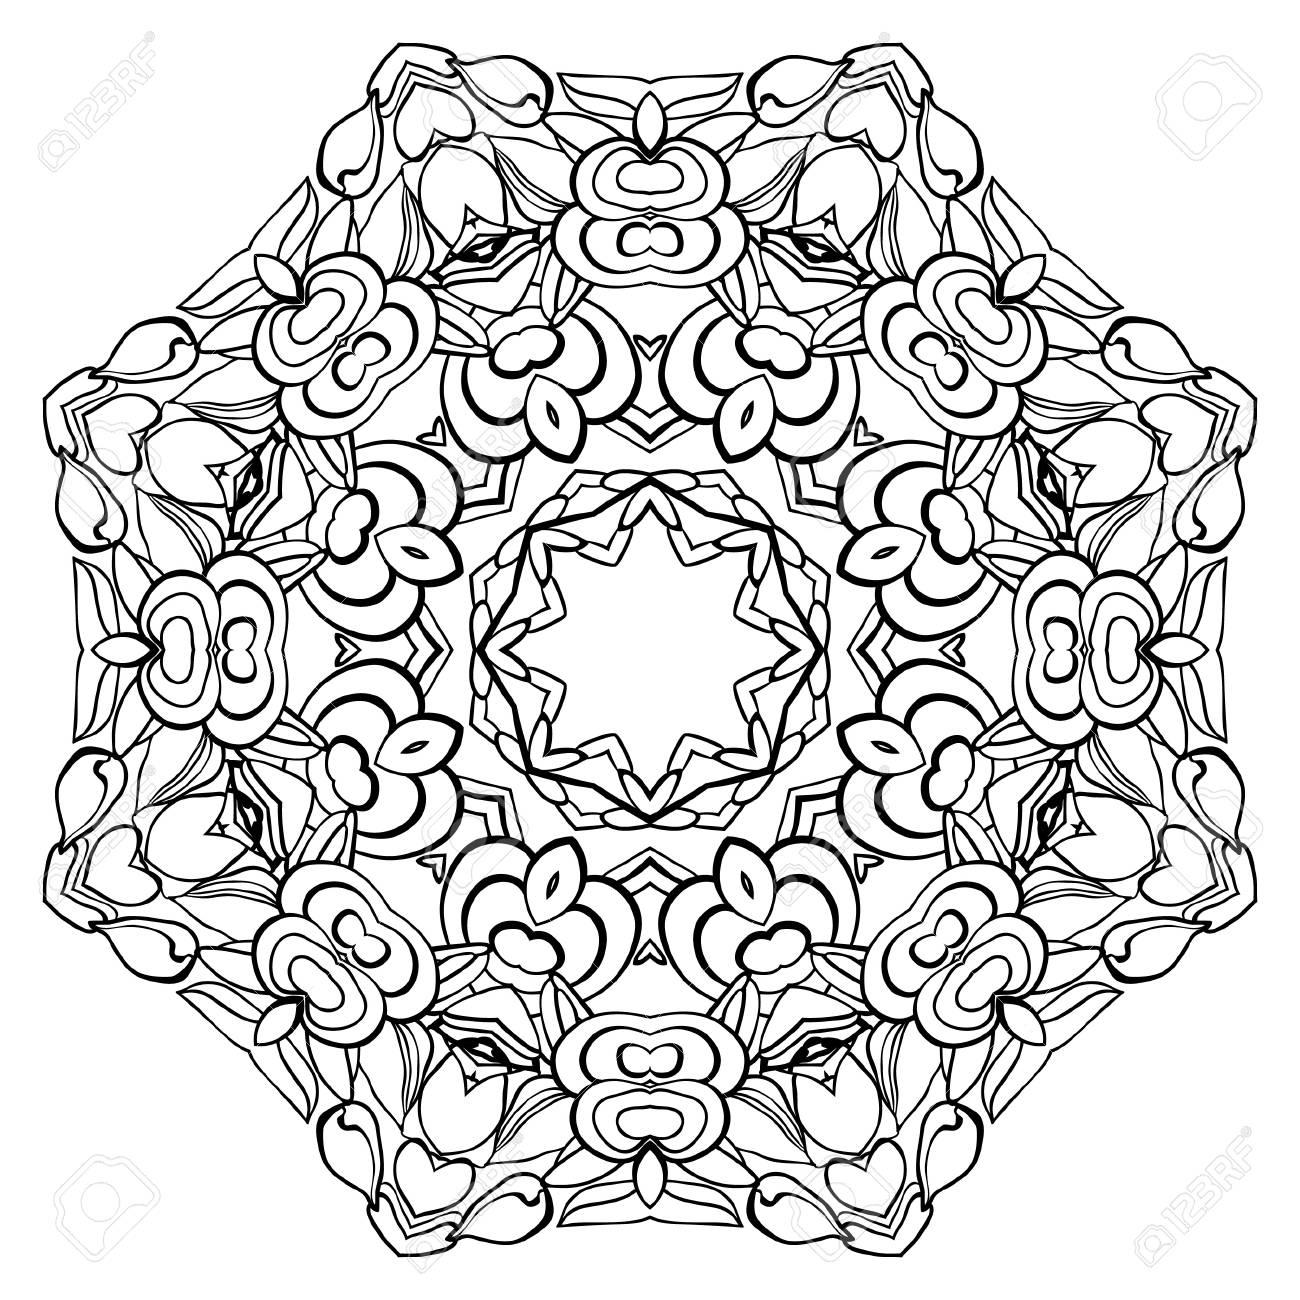 Excepcional Desafiantes Mandalas Para Colorear Imagen - Ideas Para ...